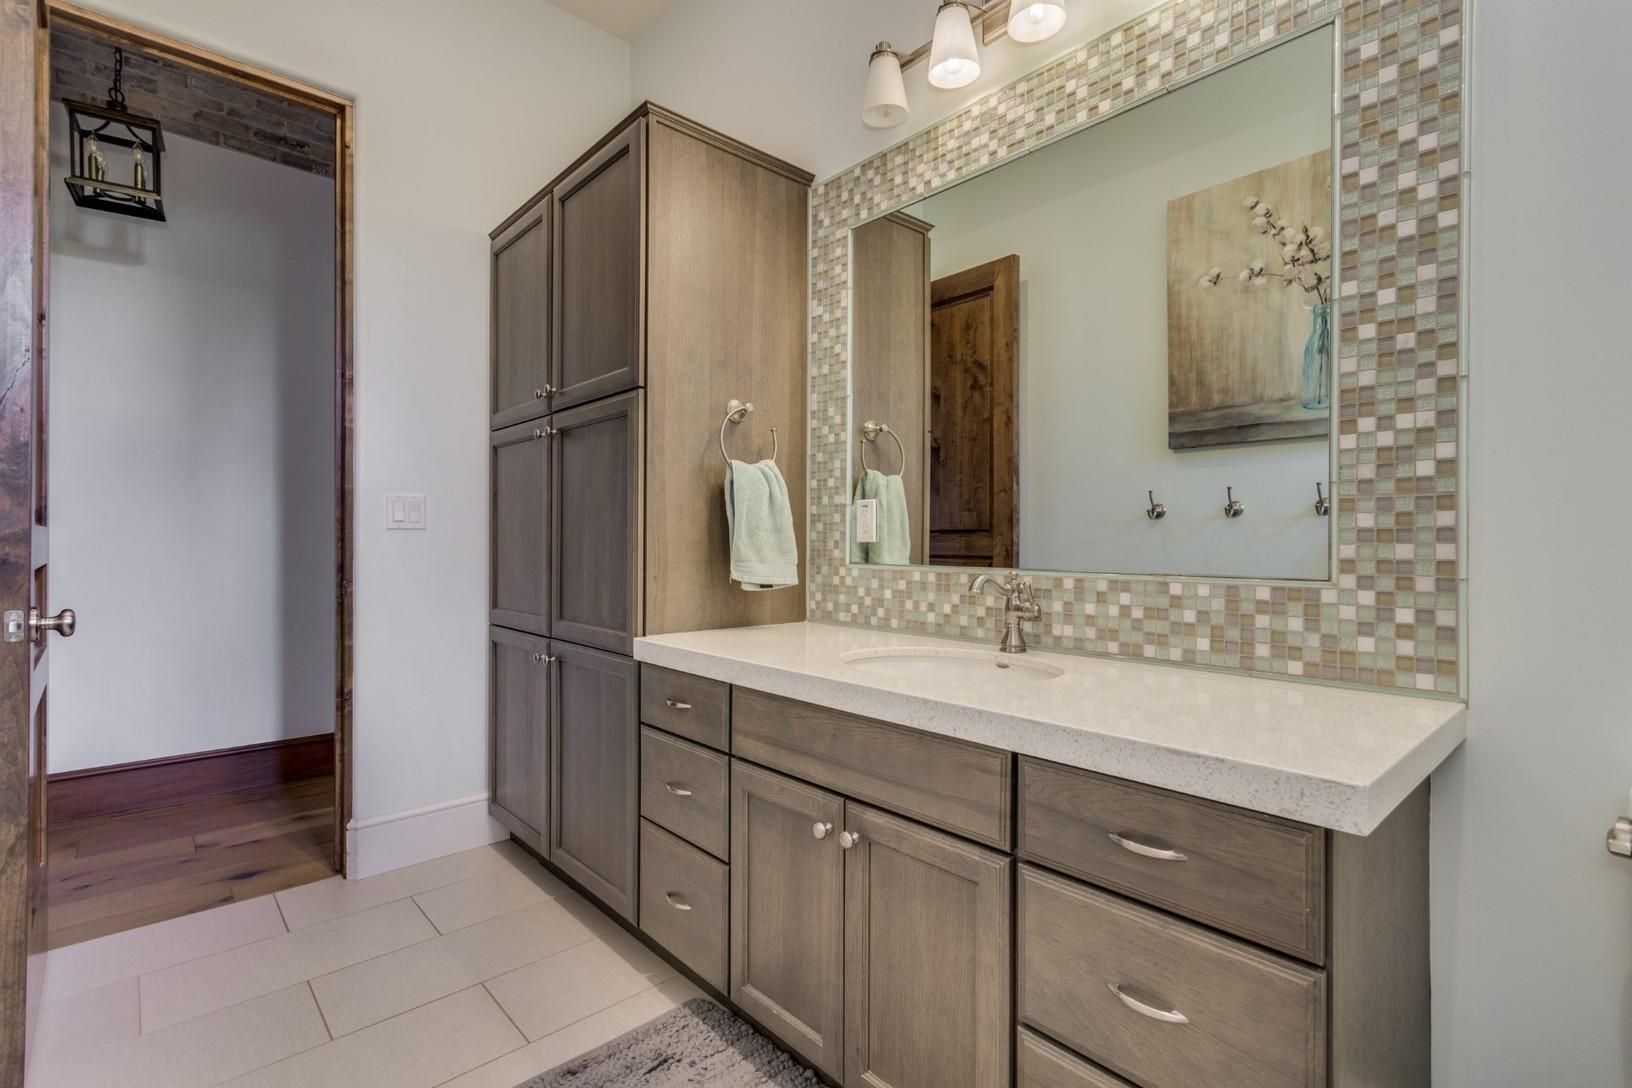 Cave Creek Bathroom Cabinetry